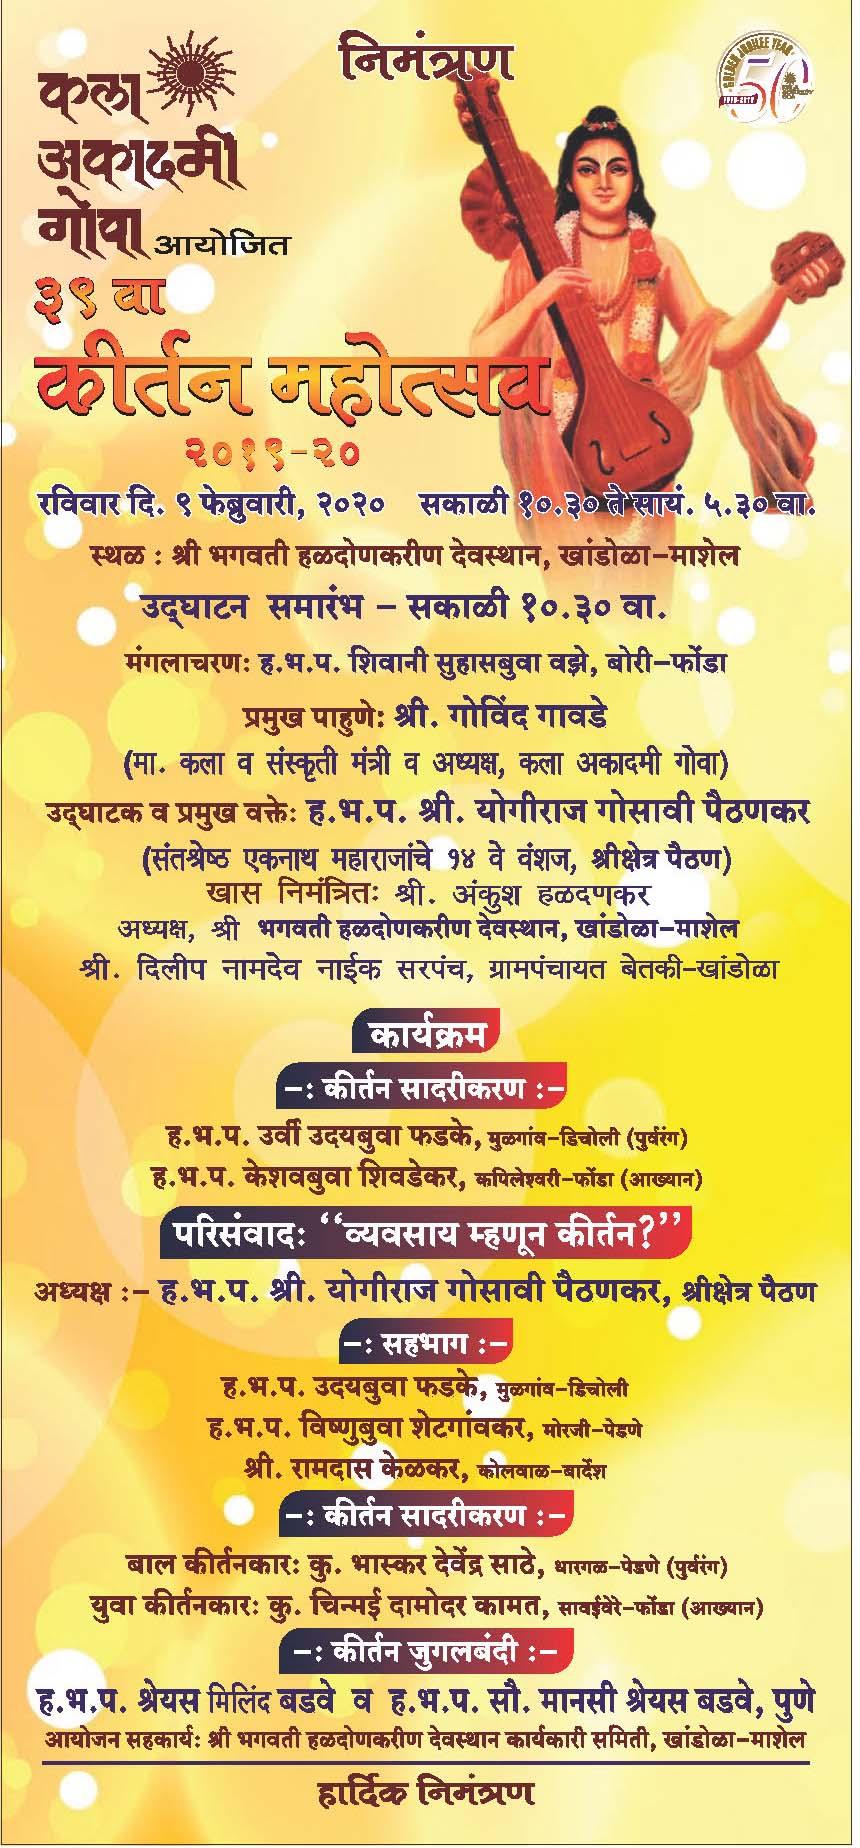 Invitation of Kirtan Mahotsav 2019-20